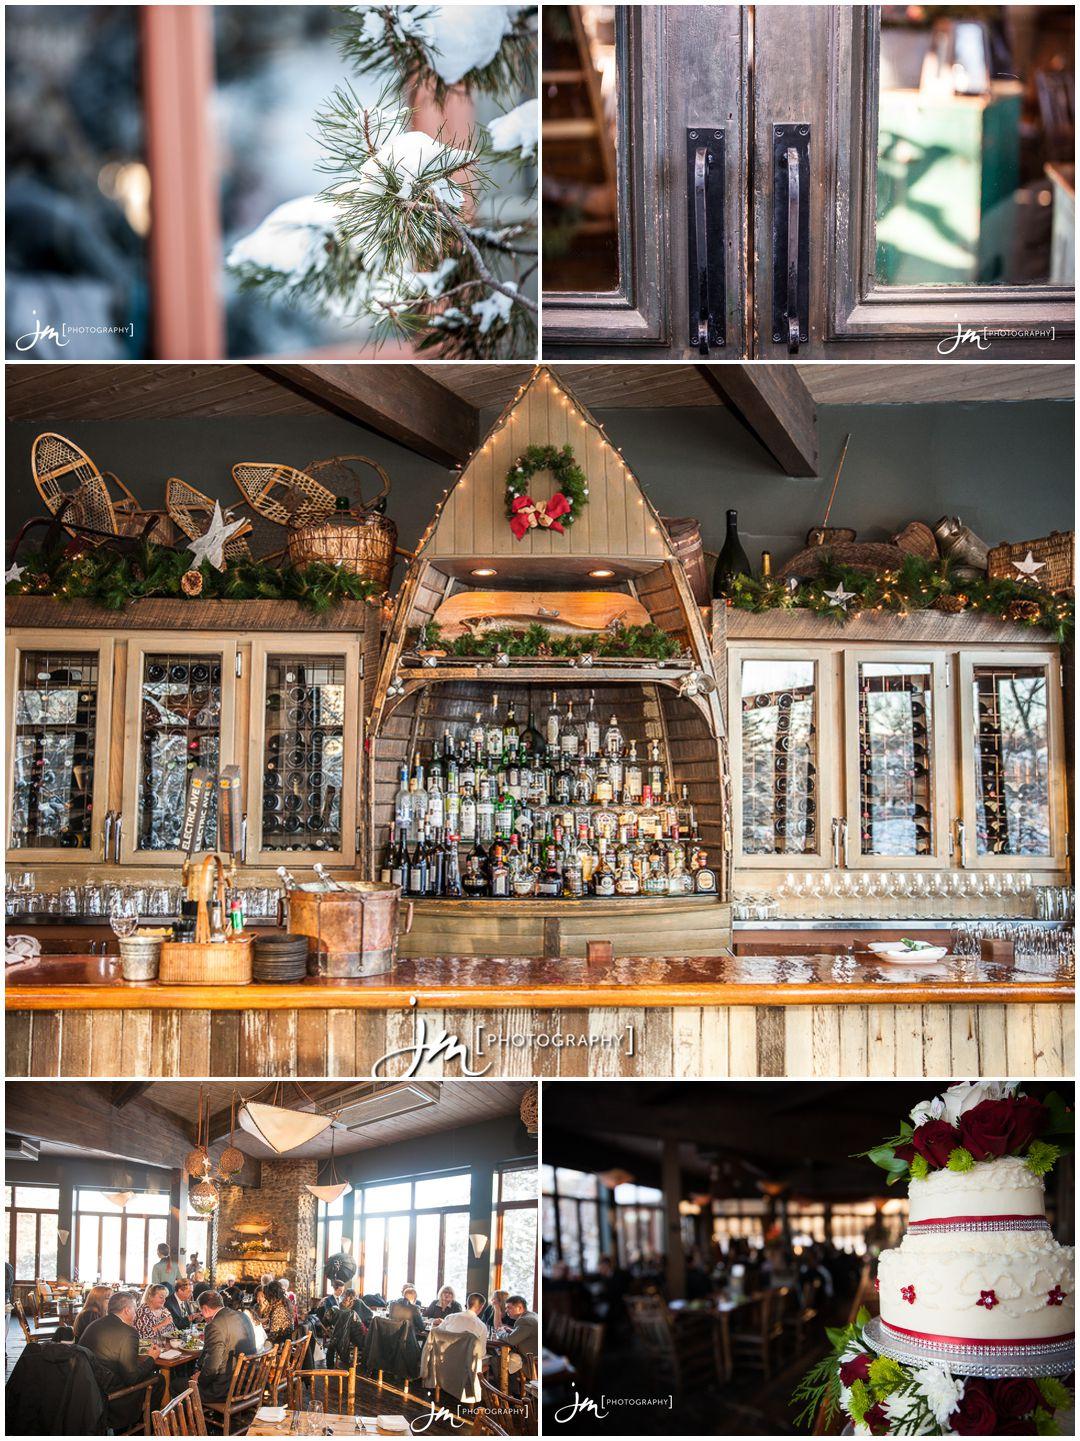 The Devans Wedding At Calgarys River Cafe In Princes Island Park